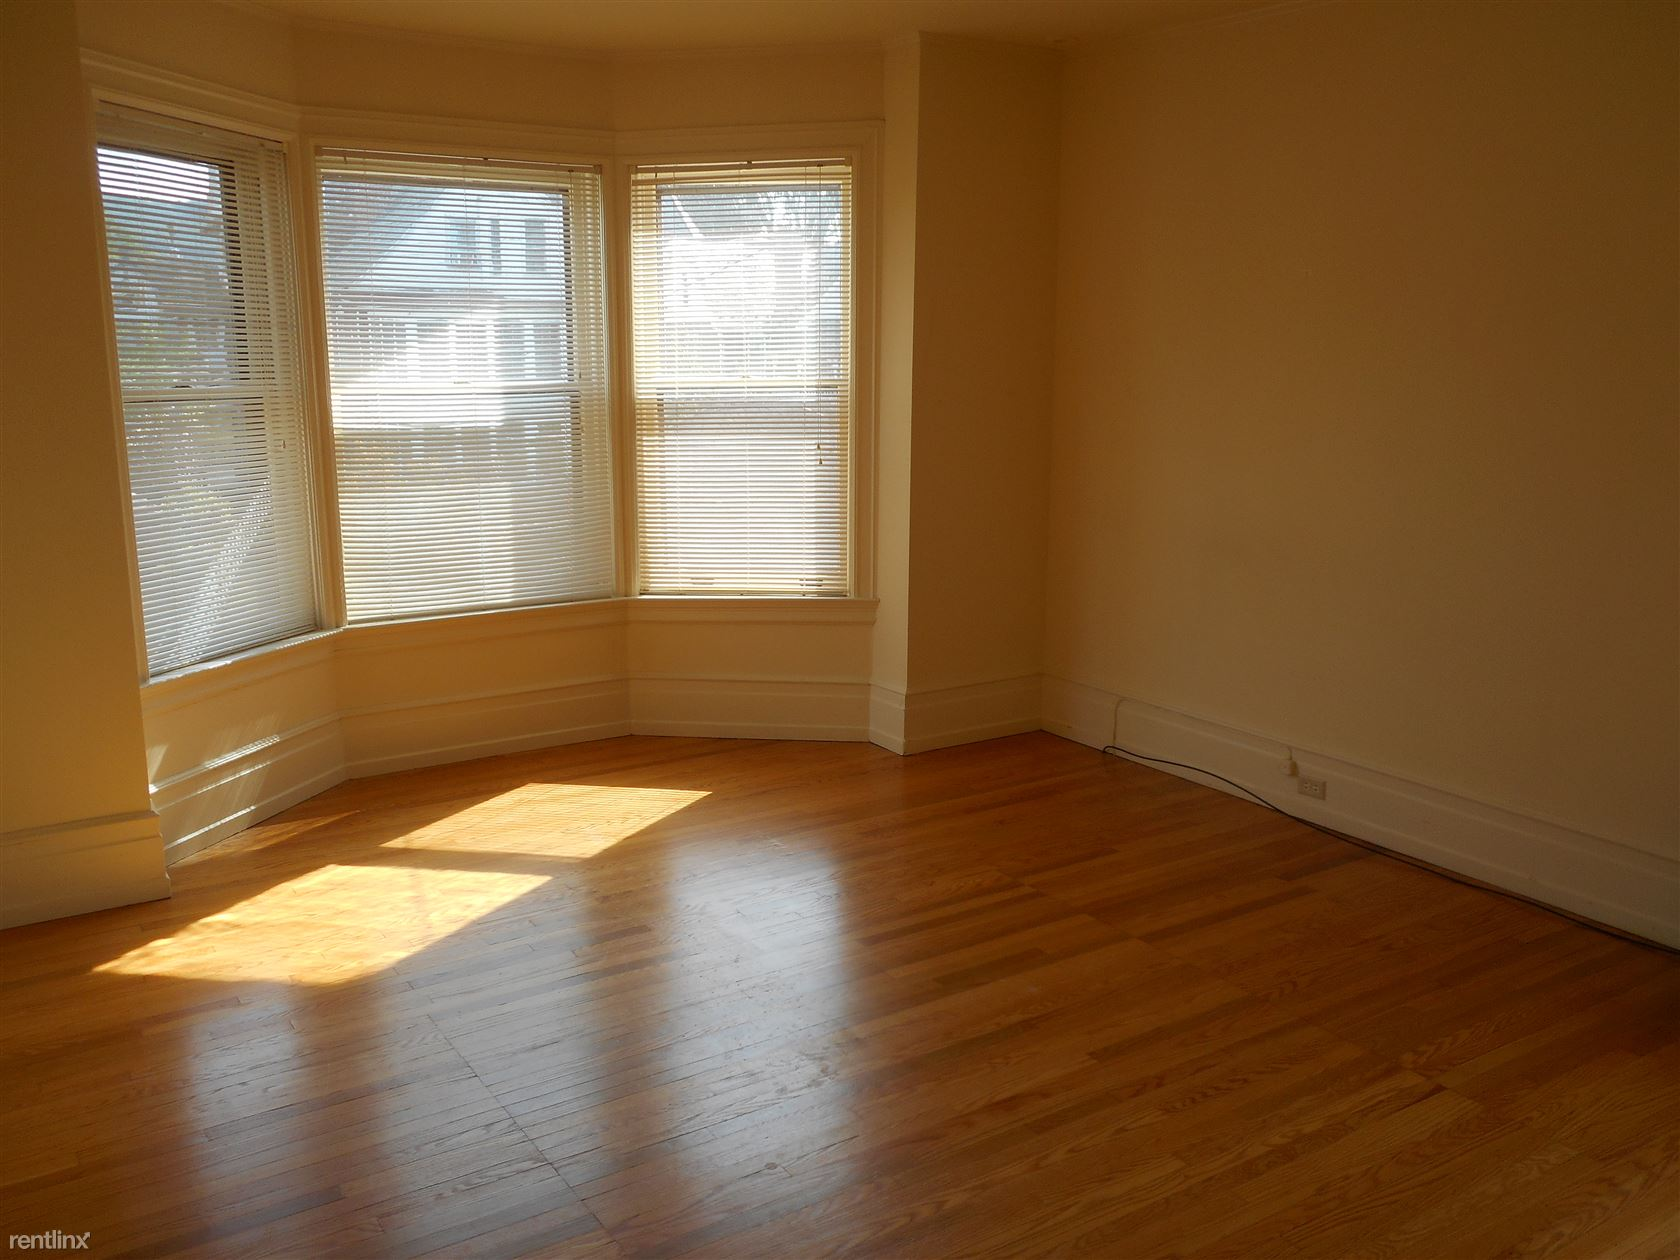 5-Bedroom Single Family Home